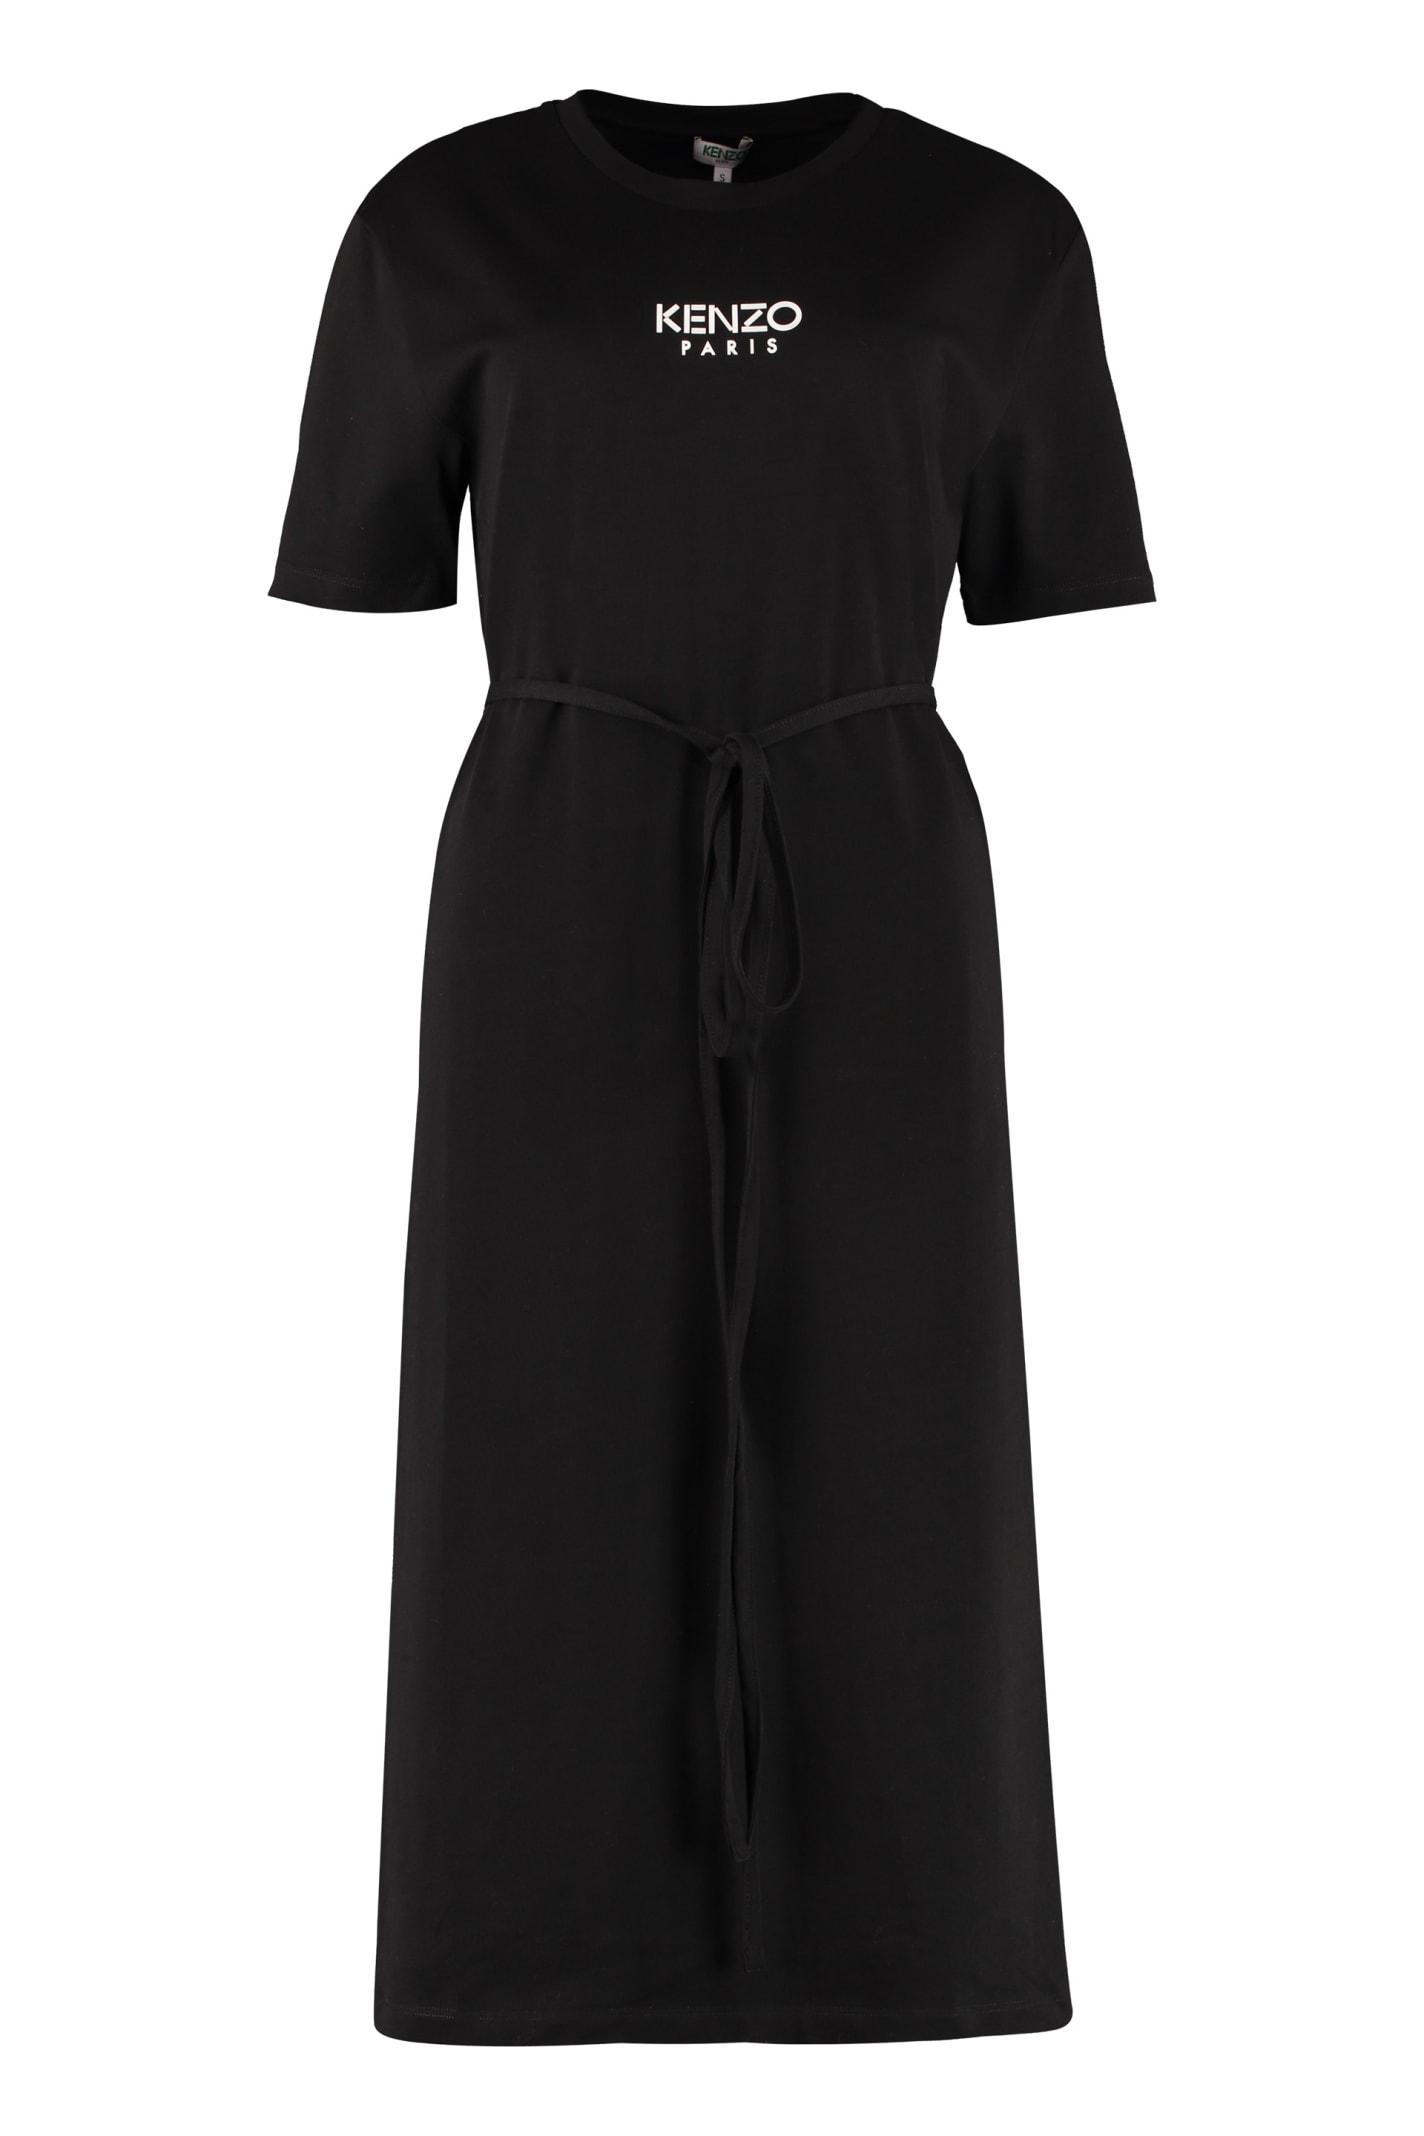 Buy Kenzo Logo Print T-shirt Dress online, shop Kenzo with free shipping